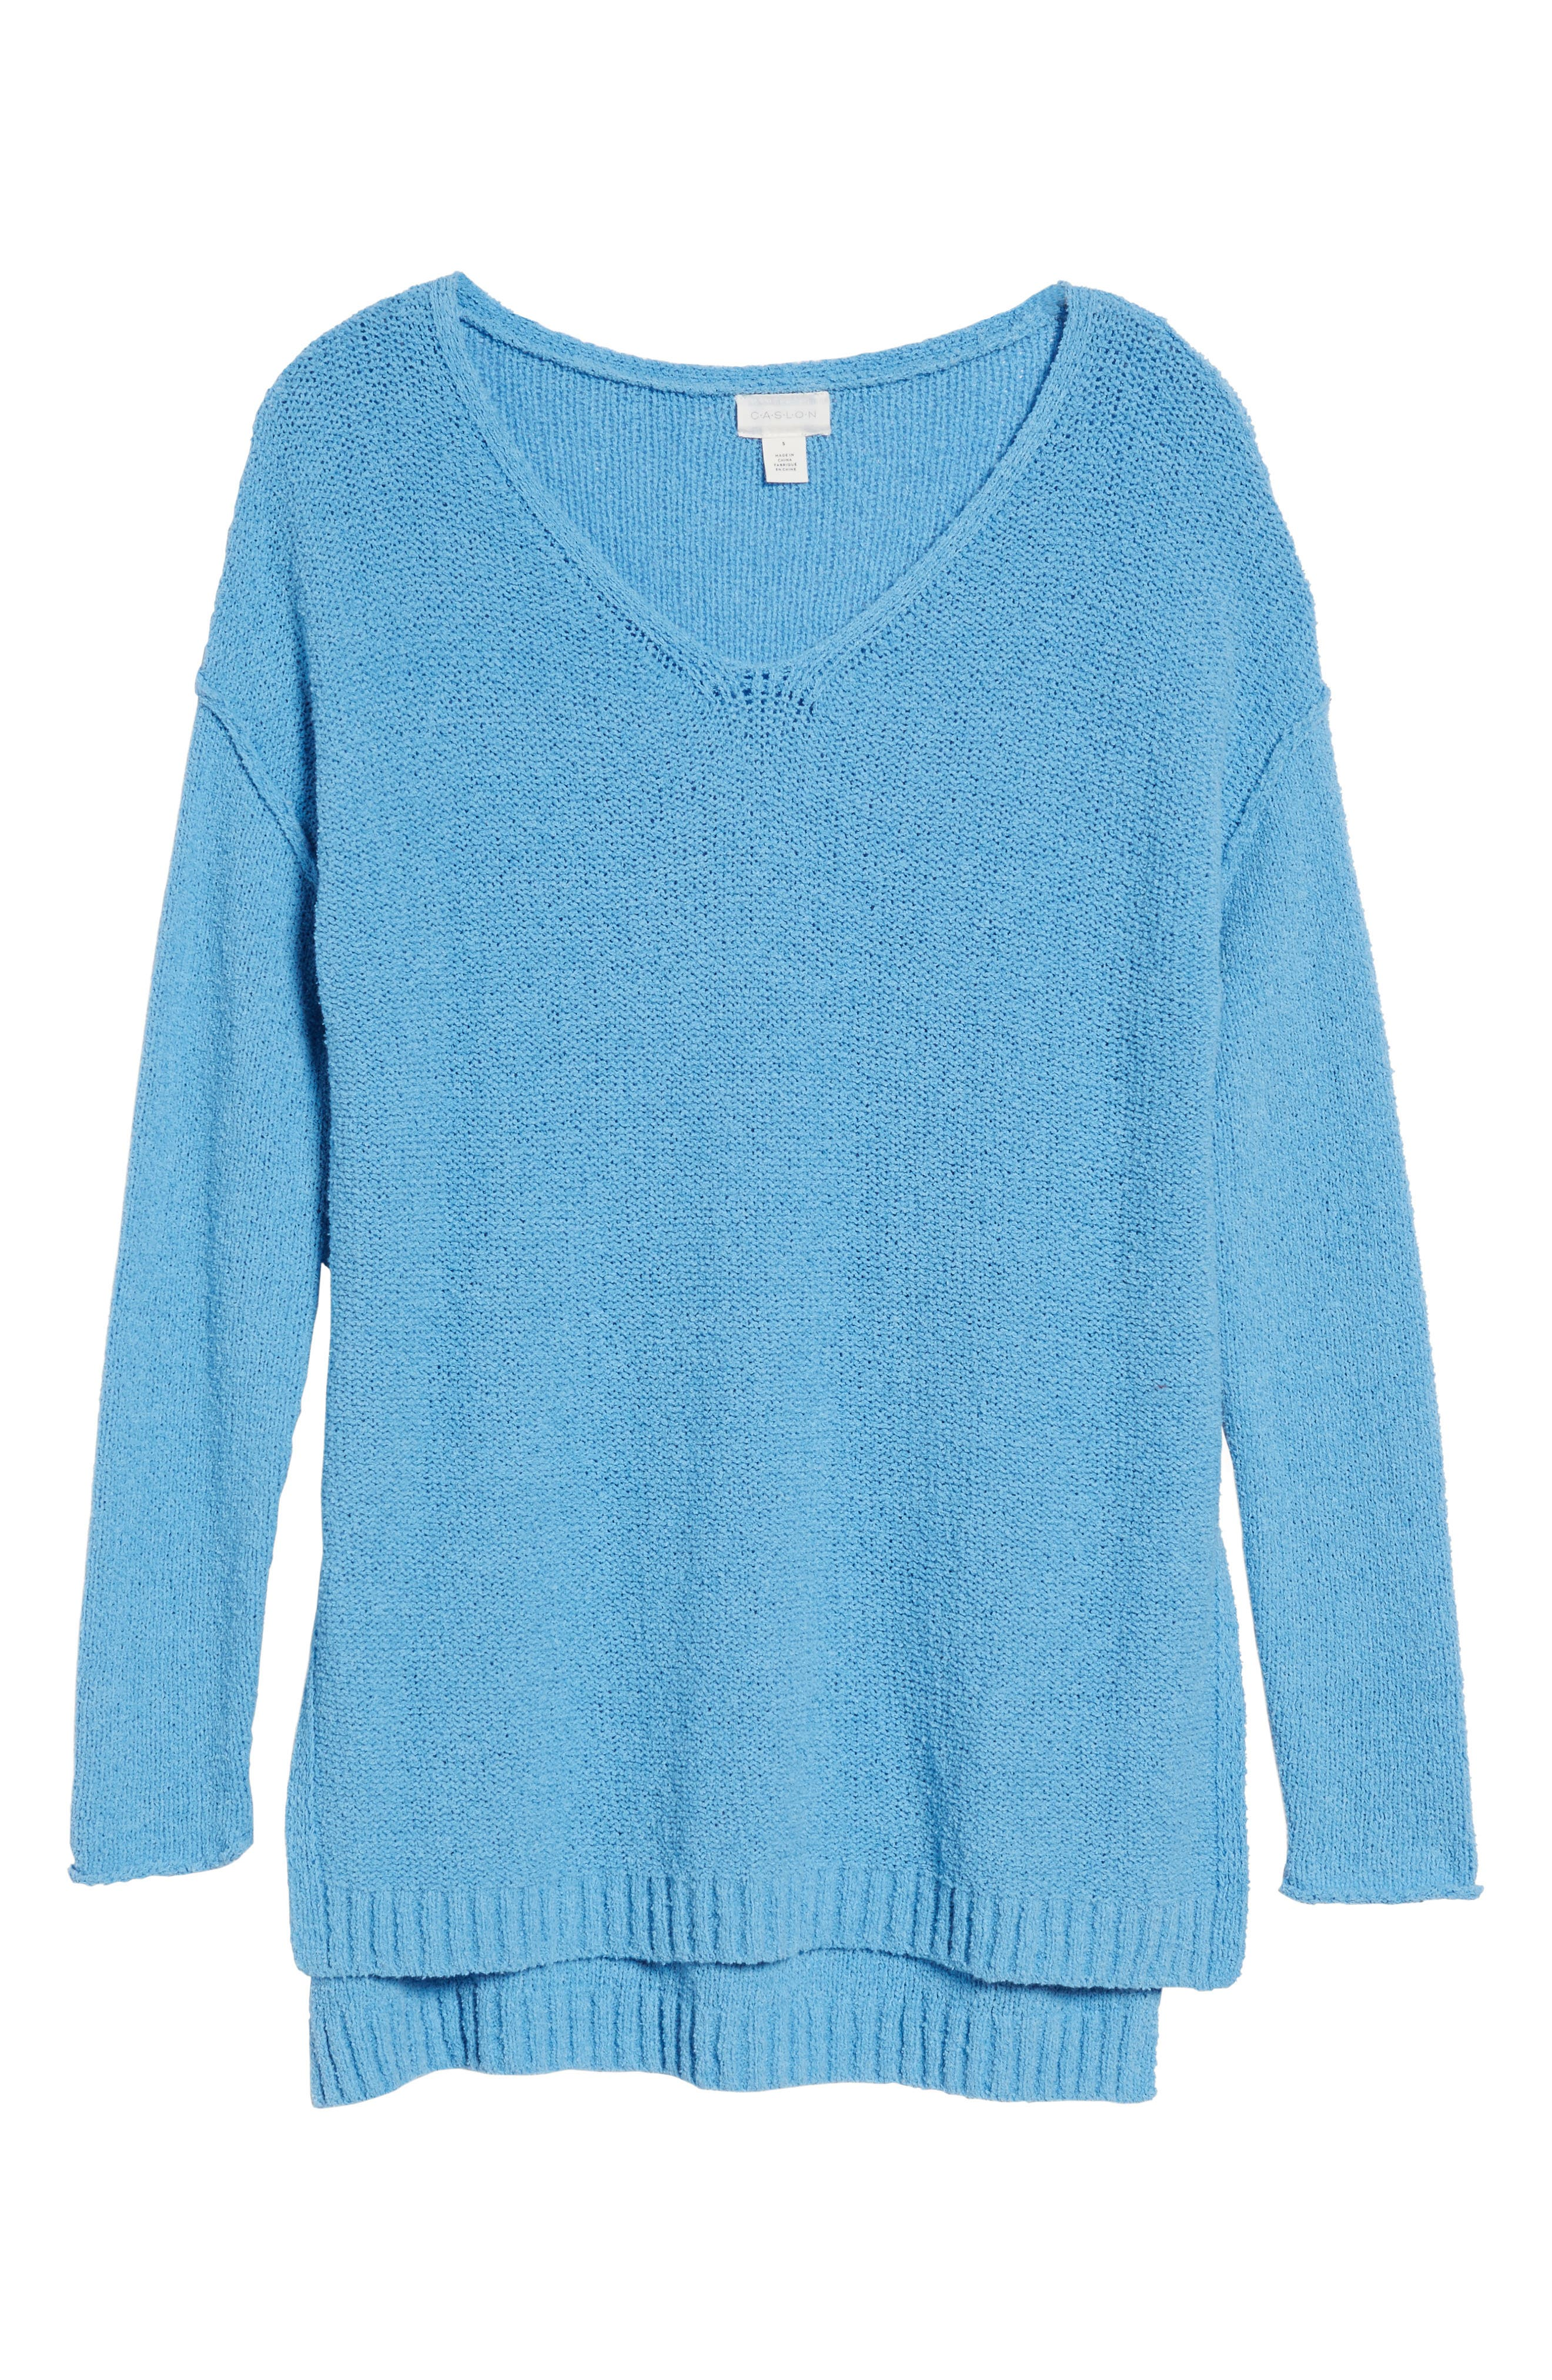 Tunic Sweater,                             Alternate thumbnail 6, color,                             Blue Lichen